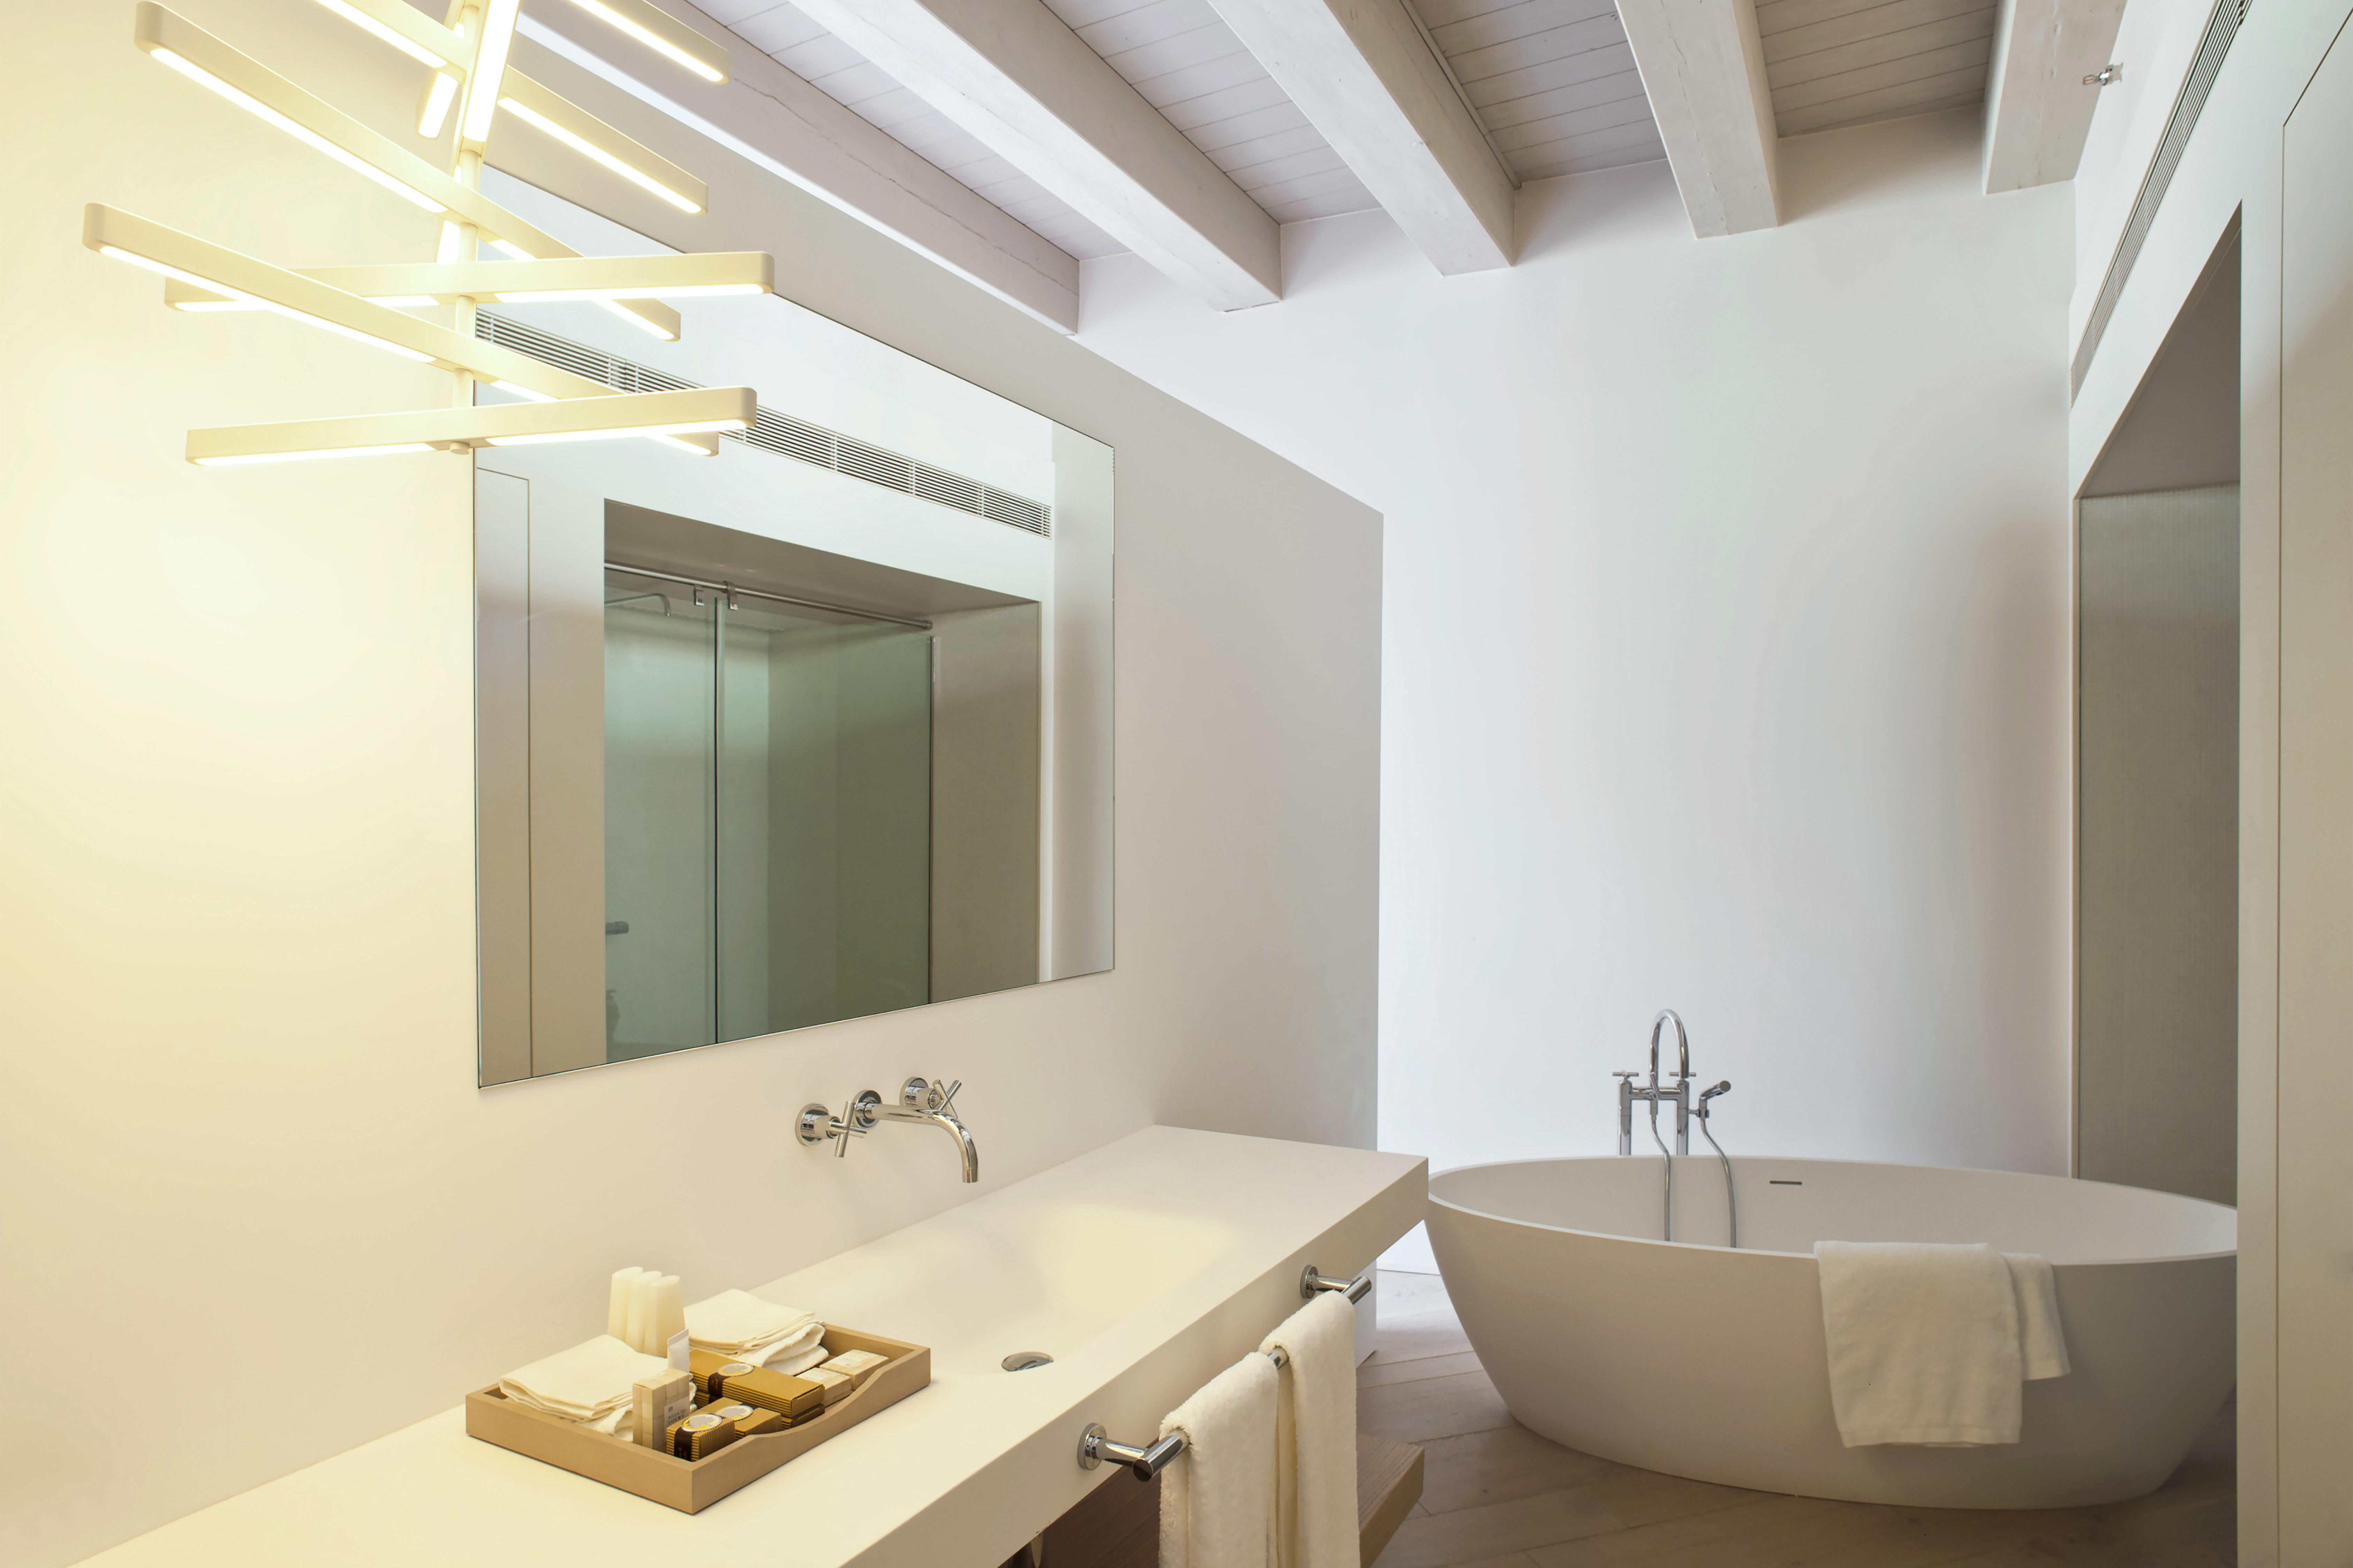 Barcelona Bath Boutique City Hip Hotels Luxury Modern Spain bathroom mirror property sink white home daylighting bathtub tan